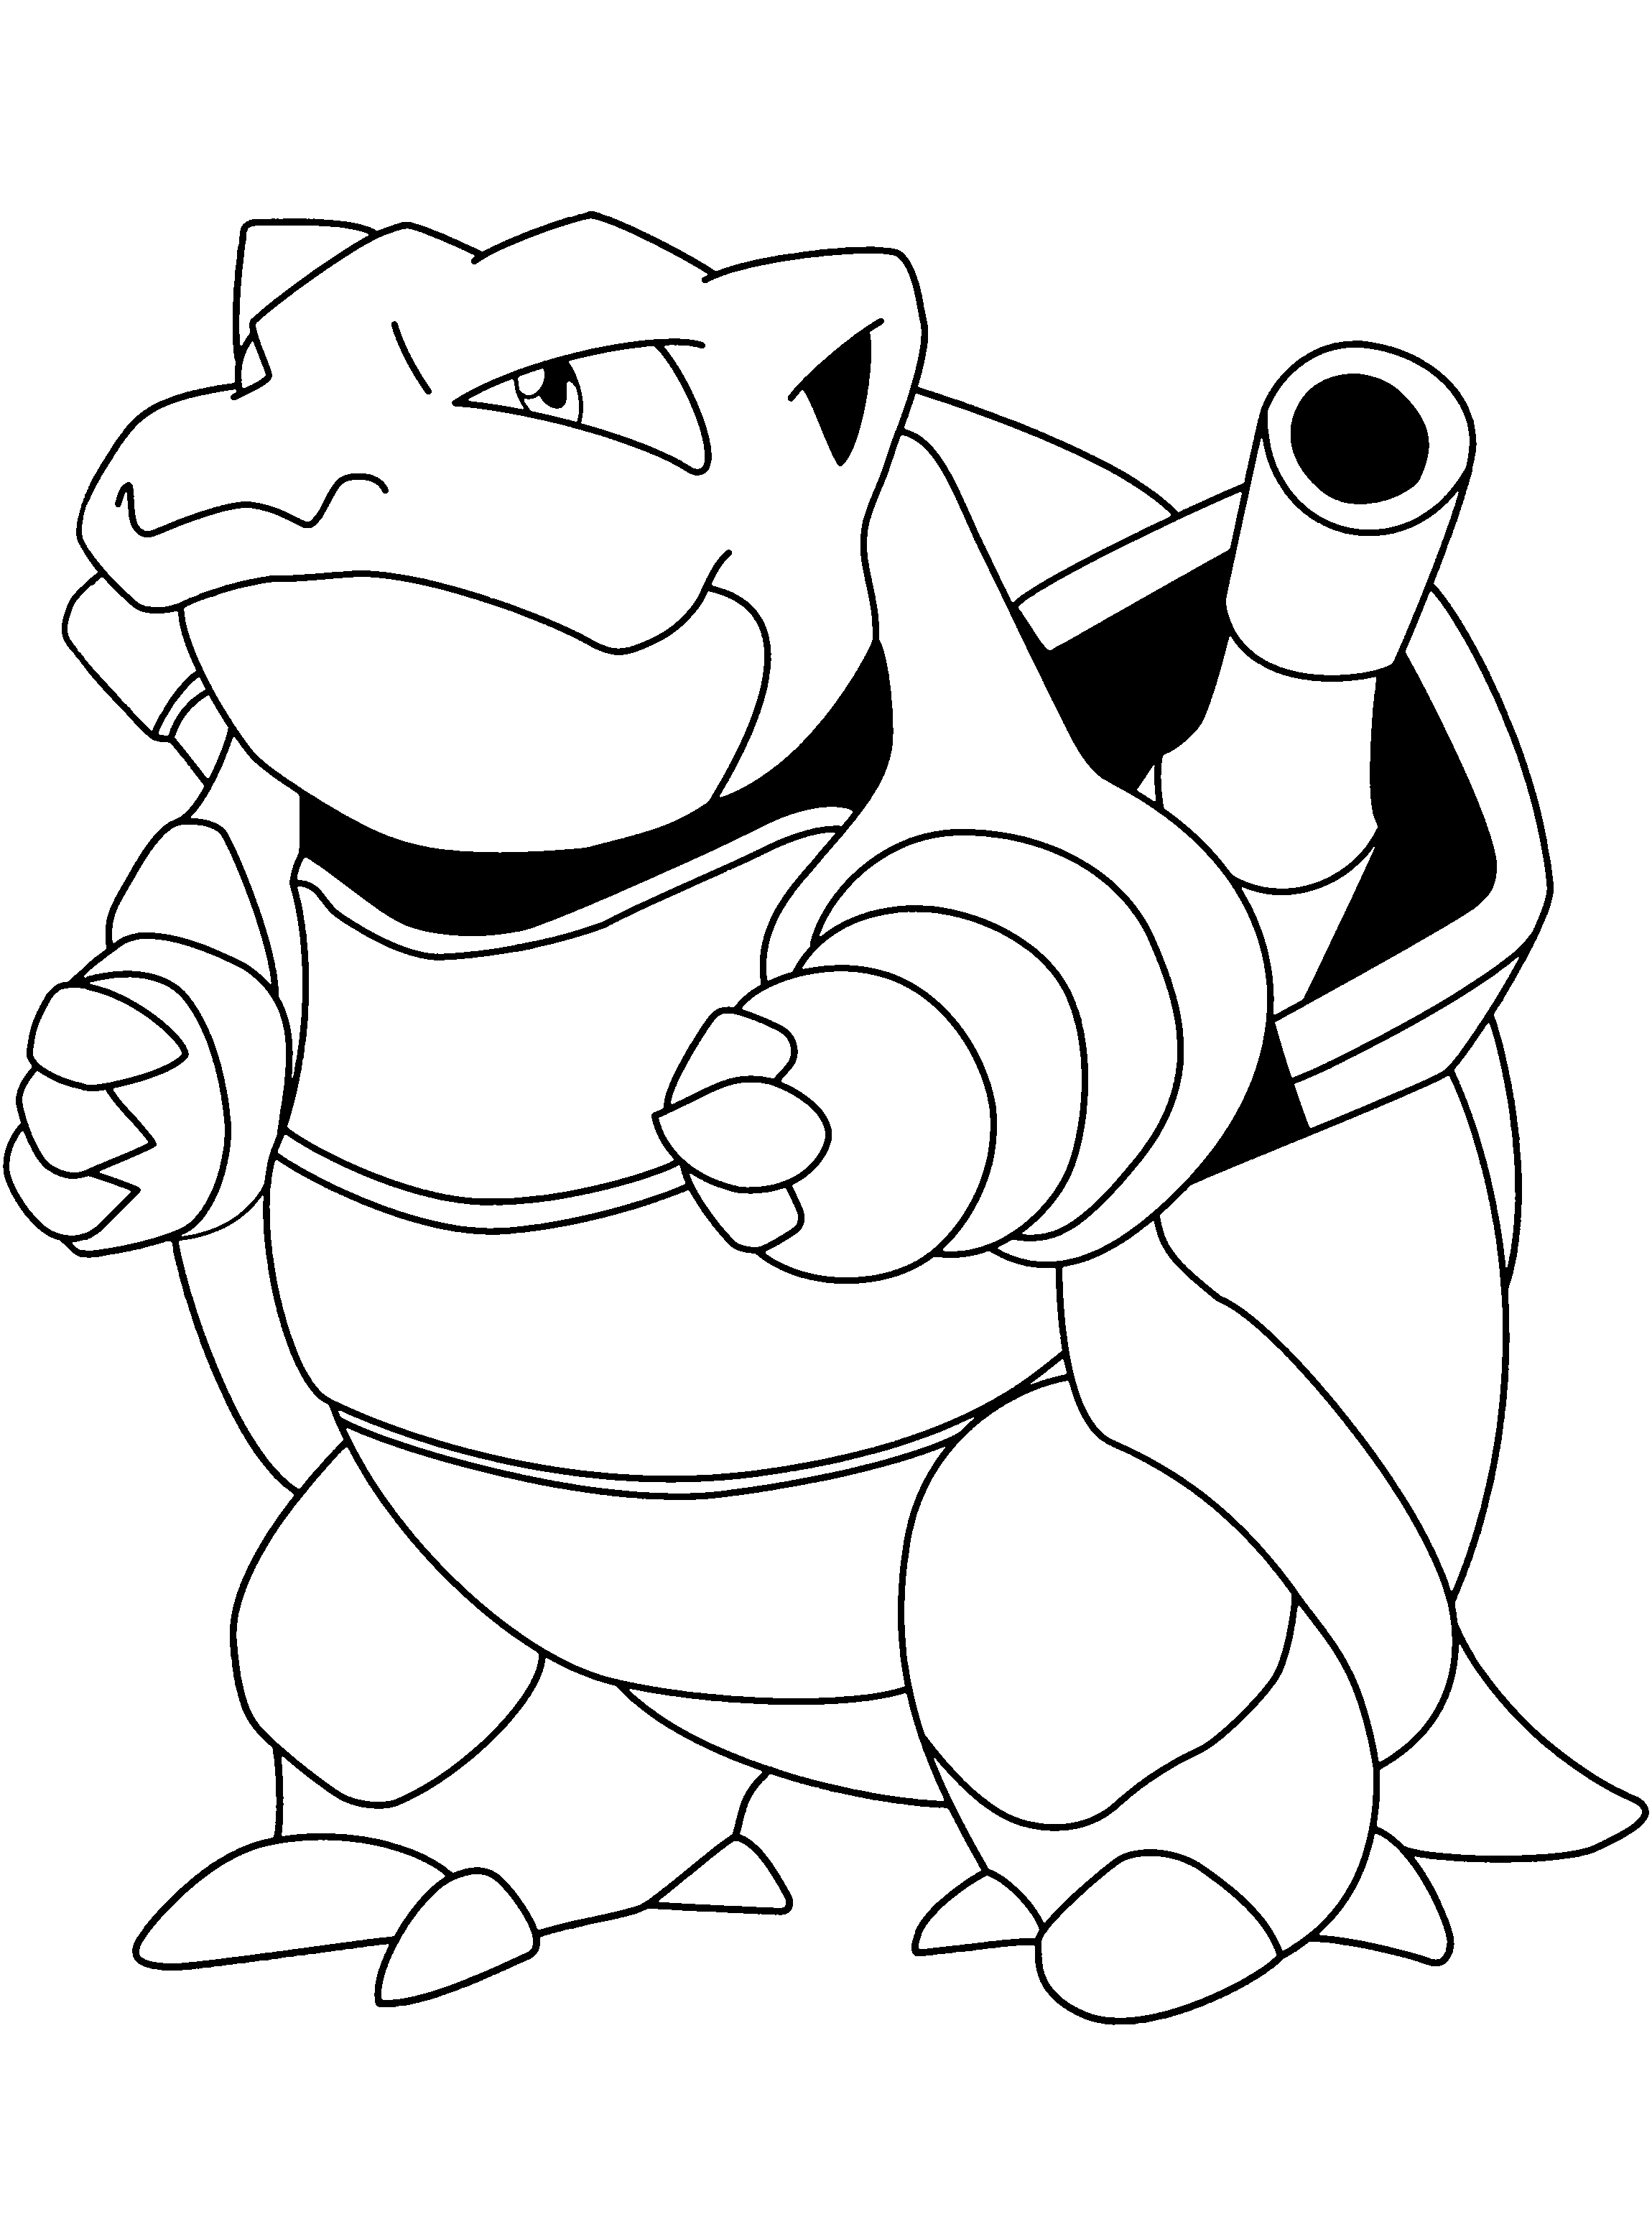 pokemon-coloring-pages-29.png (29×29) Blastoise  Pokemon